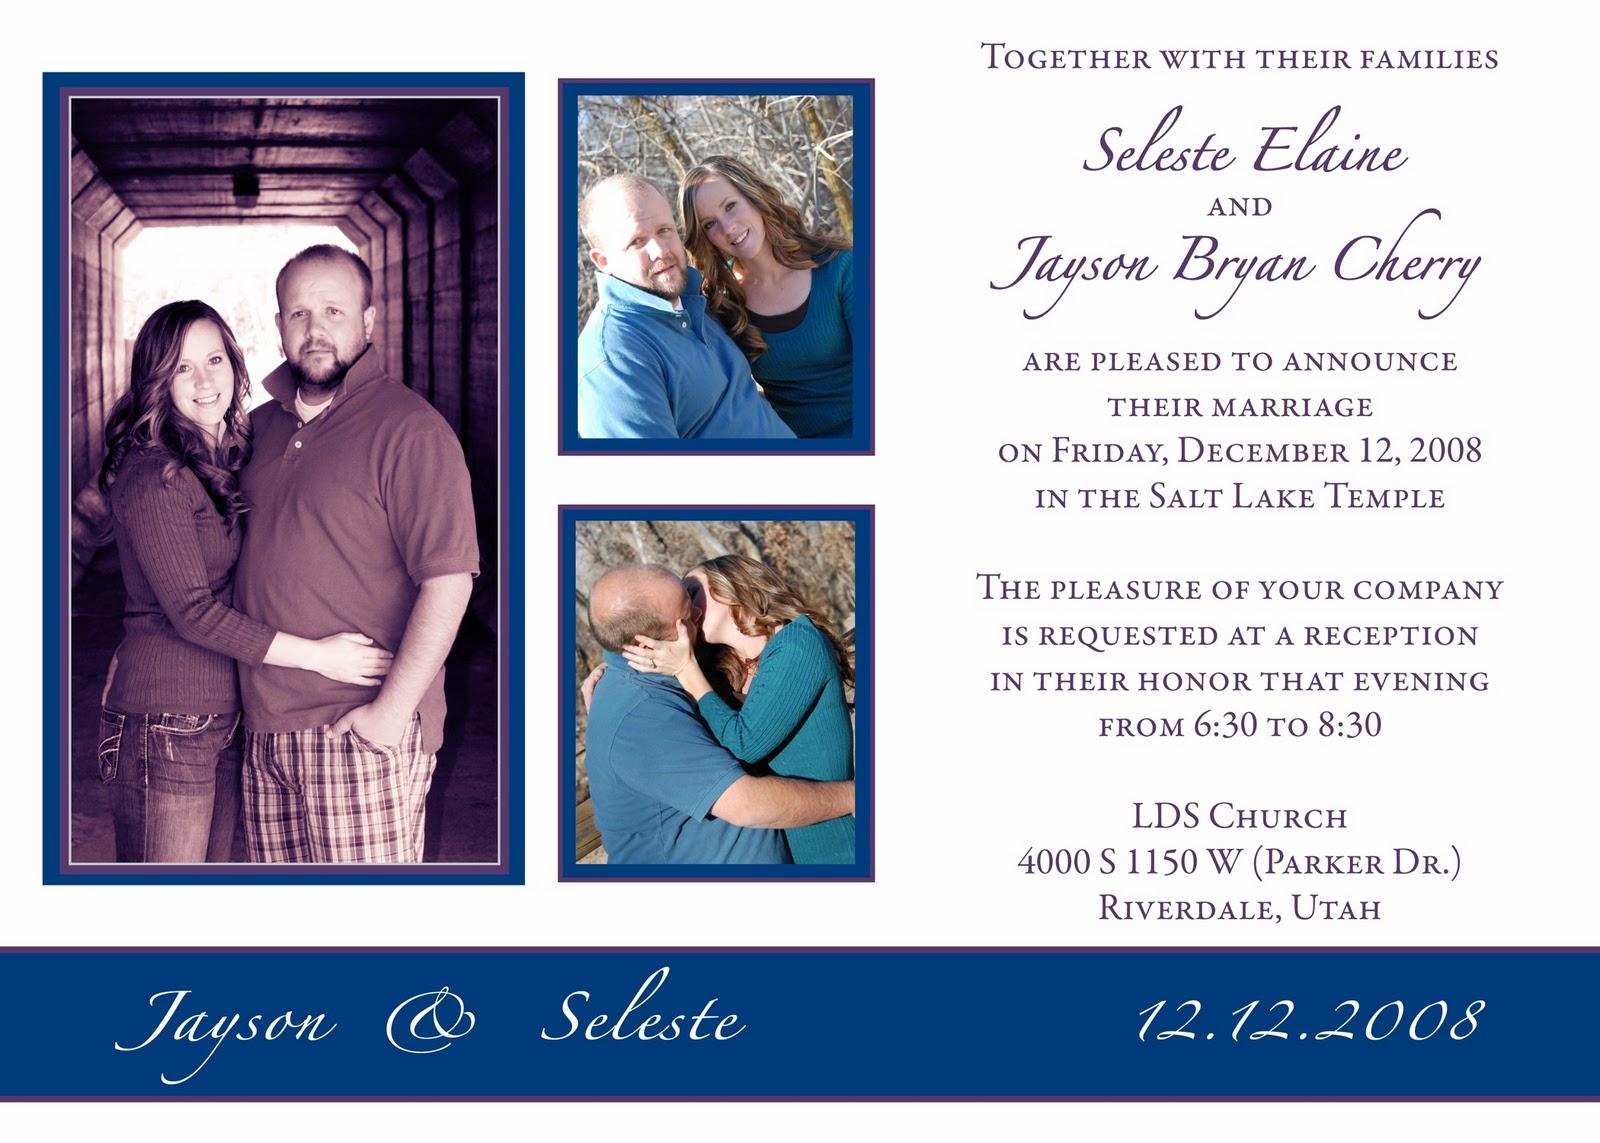 Wedding invitations shalece elynne art wedding invitations monicamarmolfo Images